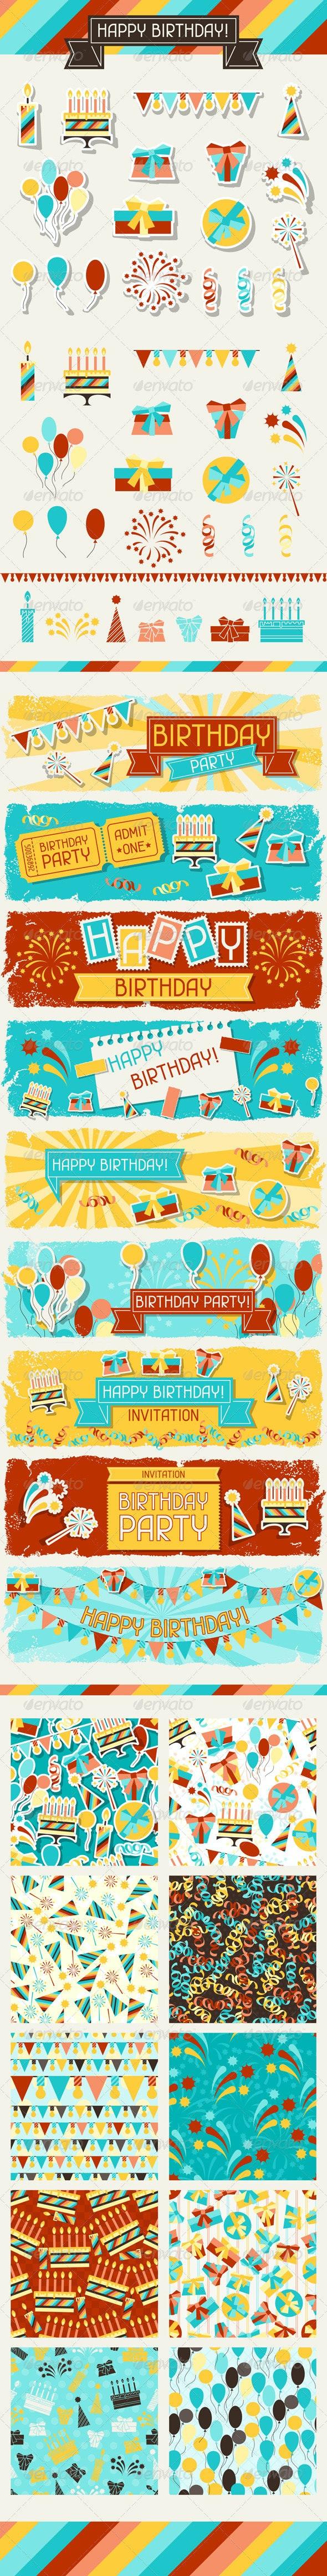 Happy Birthday Icons, Banners and Patterns - Birthdays Seasons/Holidays